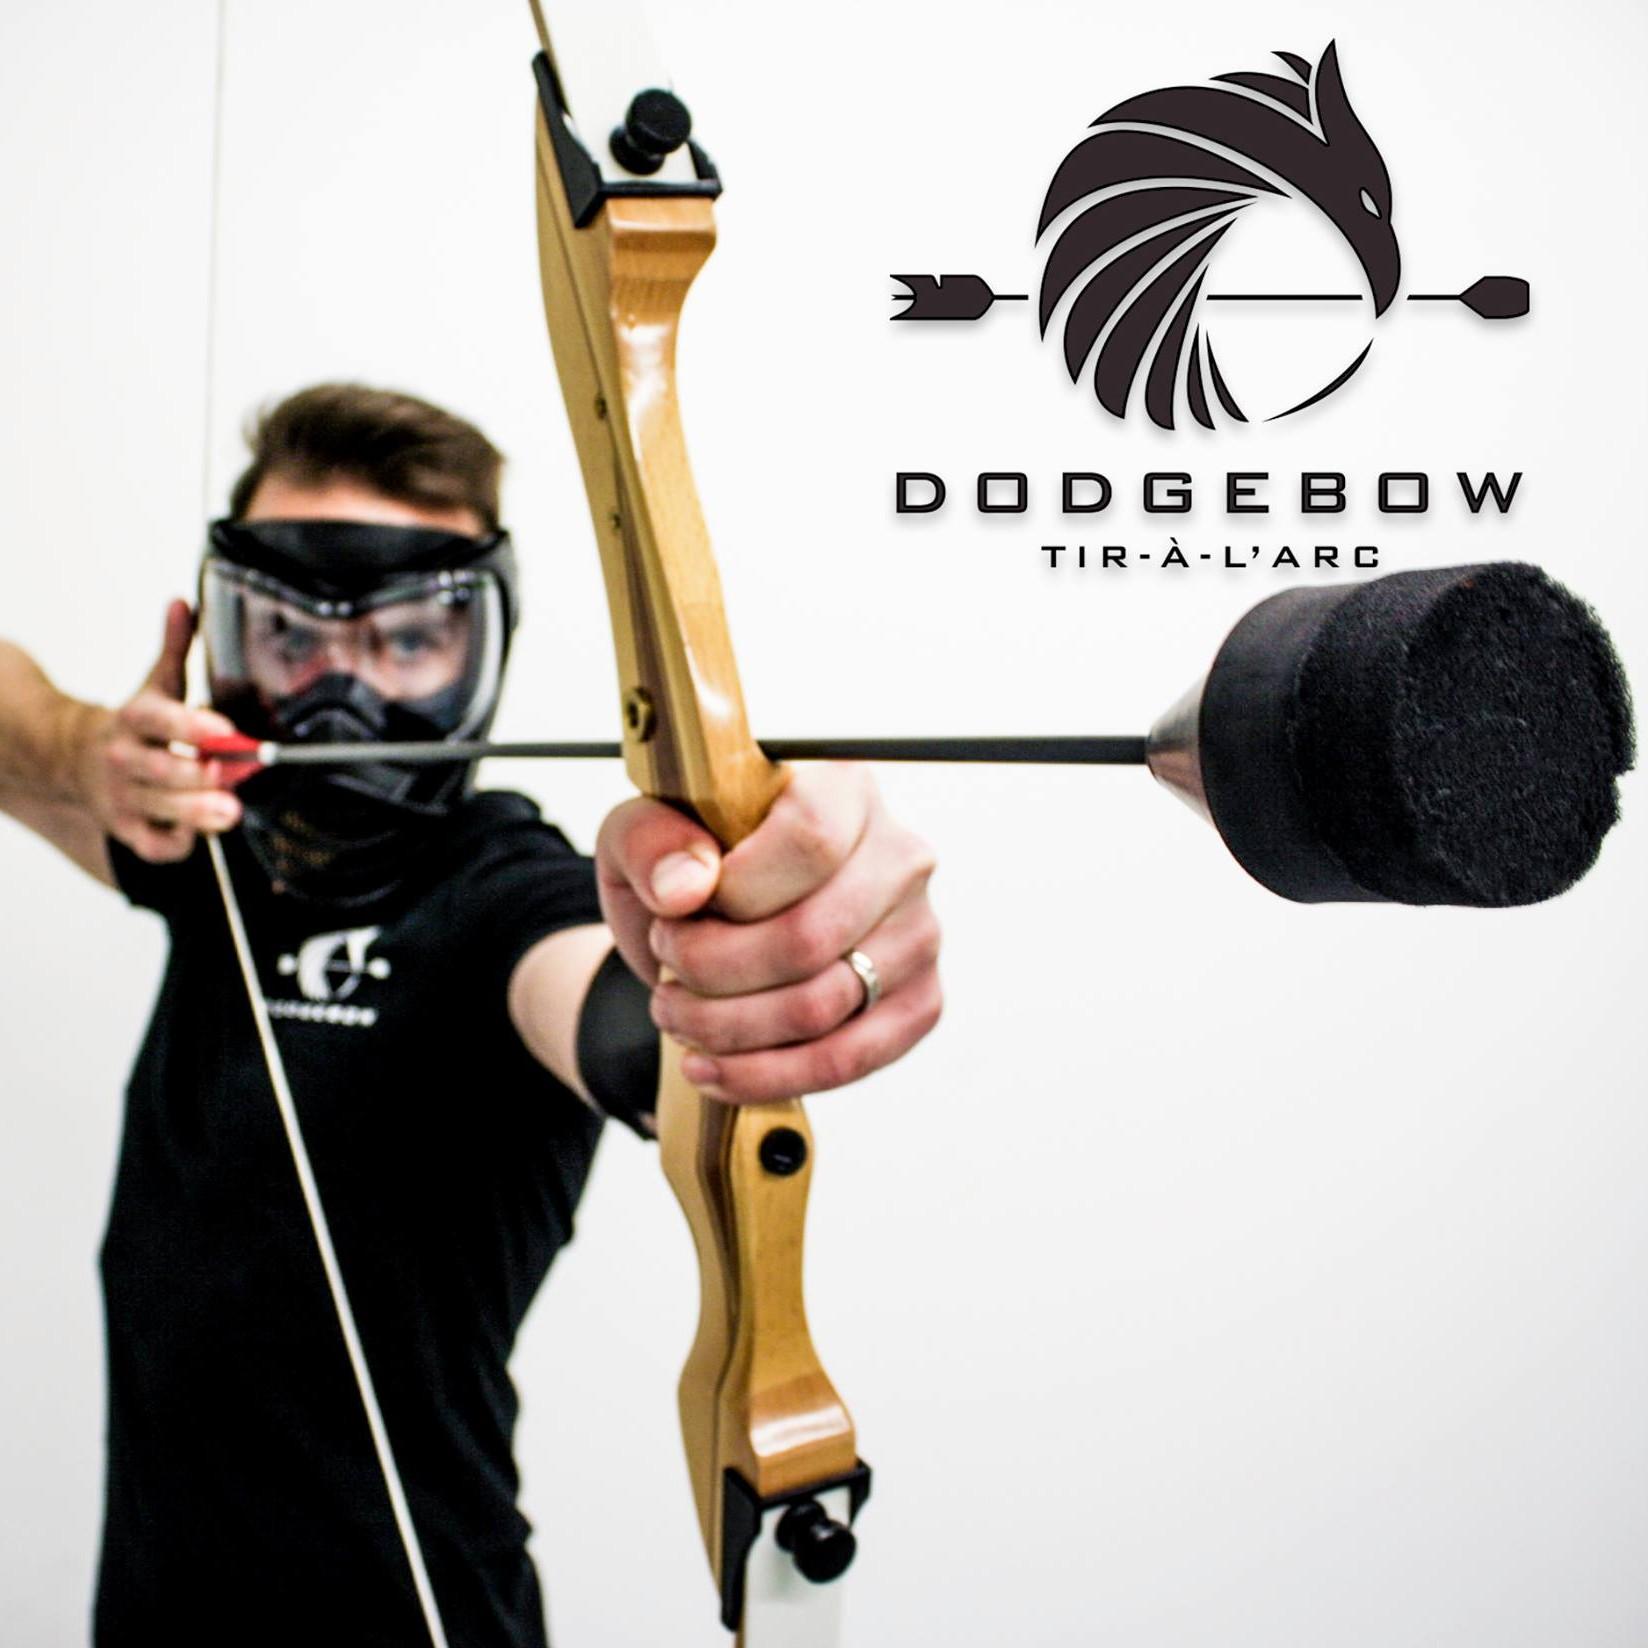 dodgebow-photo-8